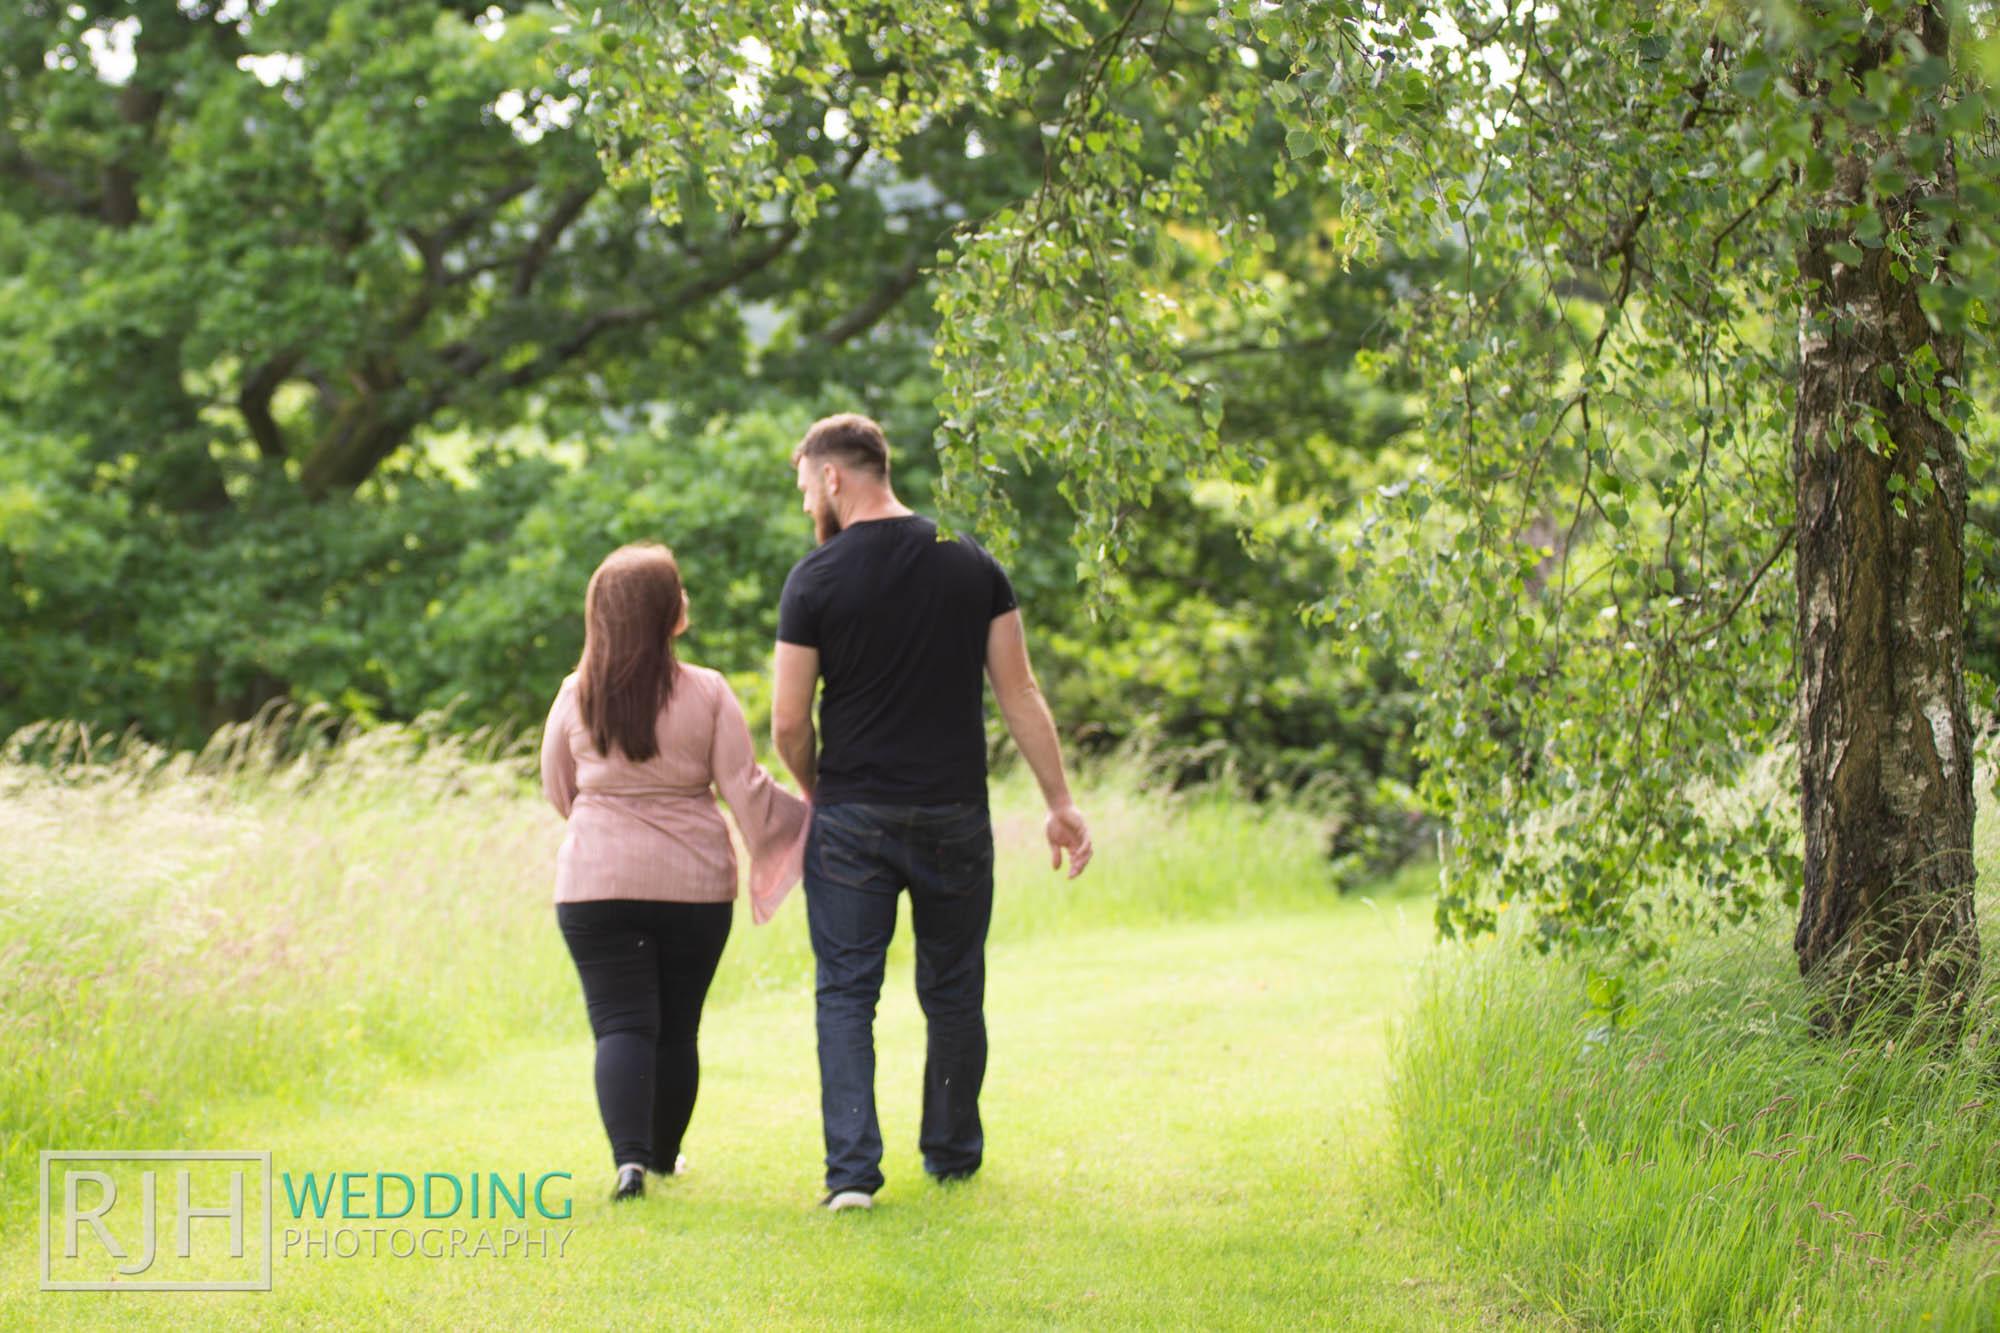 Osmaston Park Wedding Photographer - Jodie & Oli_006_IMG_7474.jpg